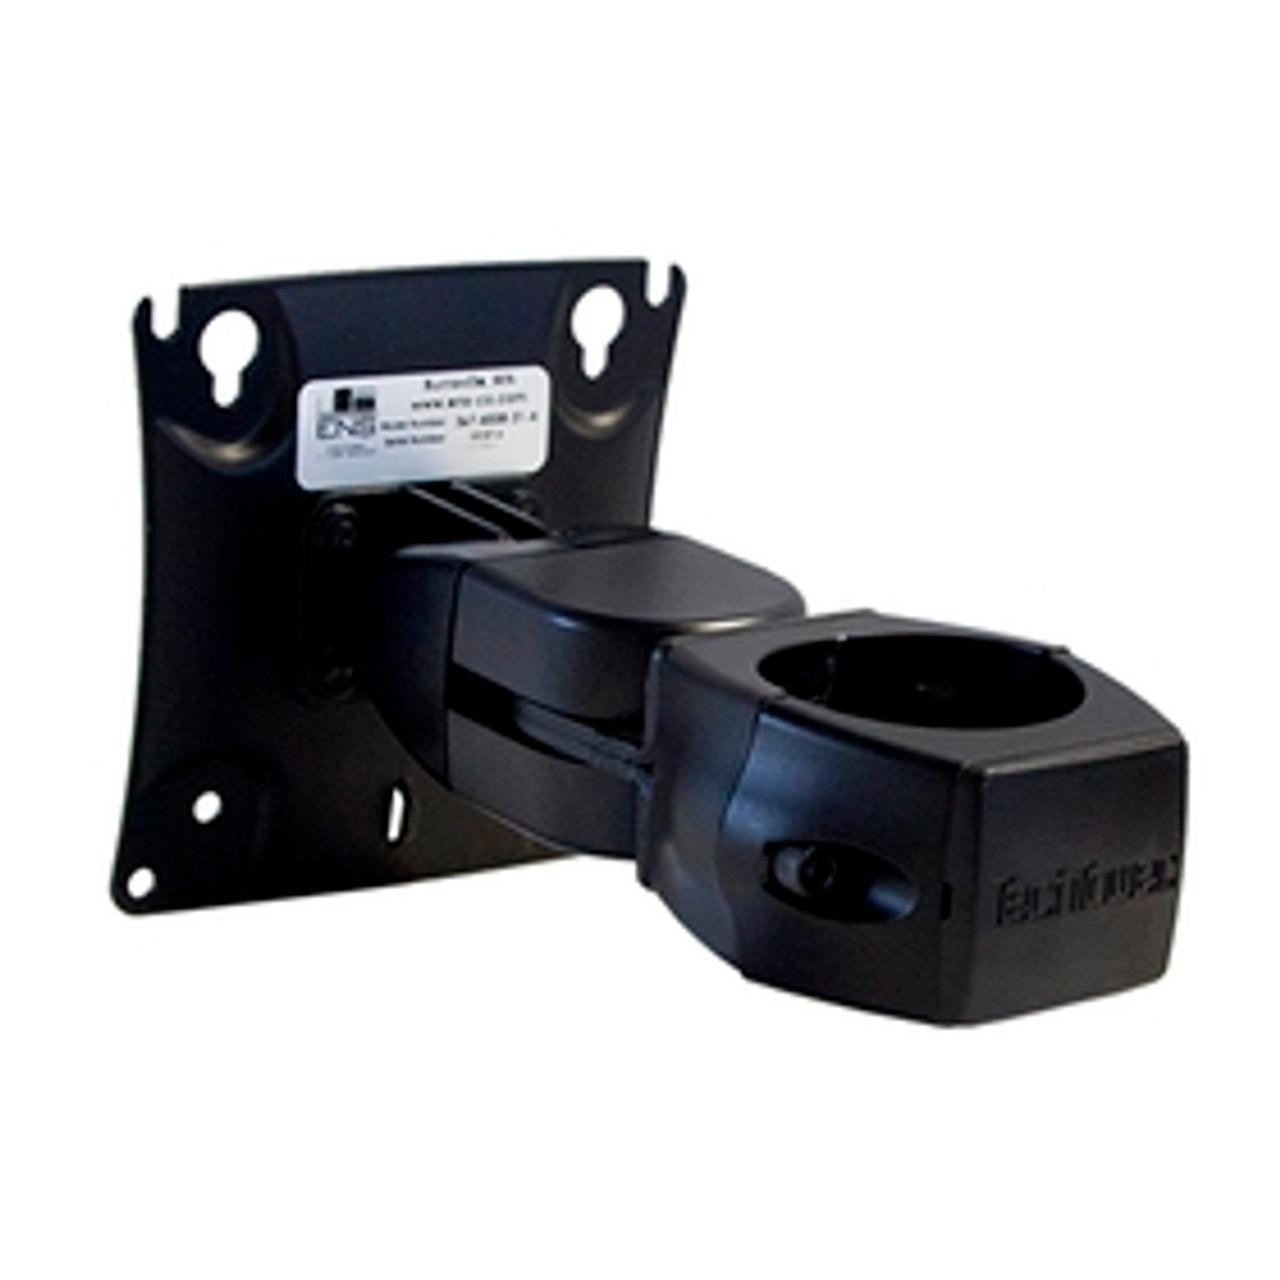 POS Double Pivot Flat Panel Monitor Mount Fixed Pole Clamp